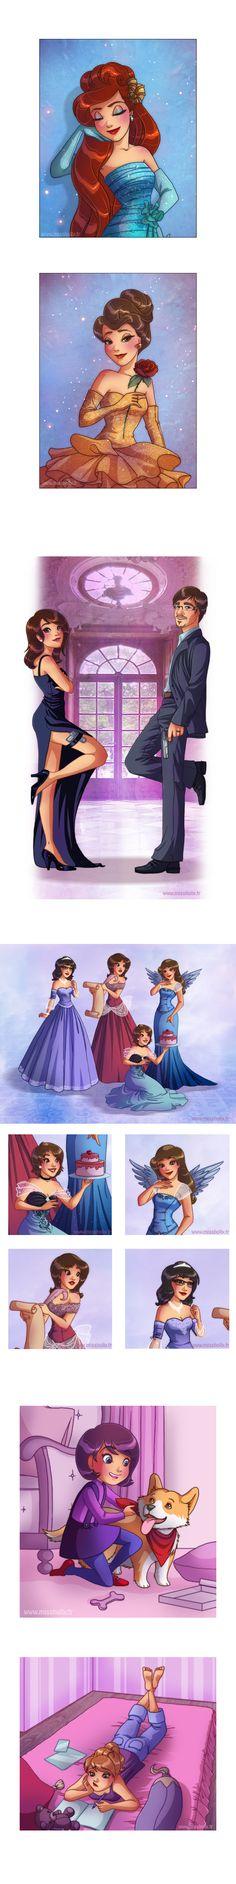 jouets Disney 'haute couture'